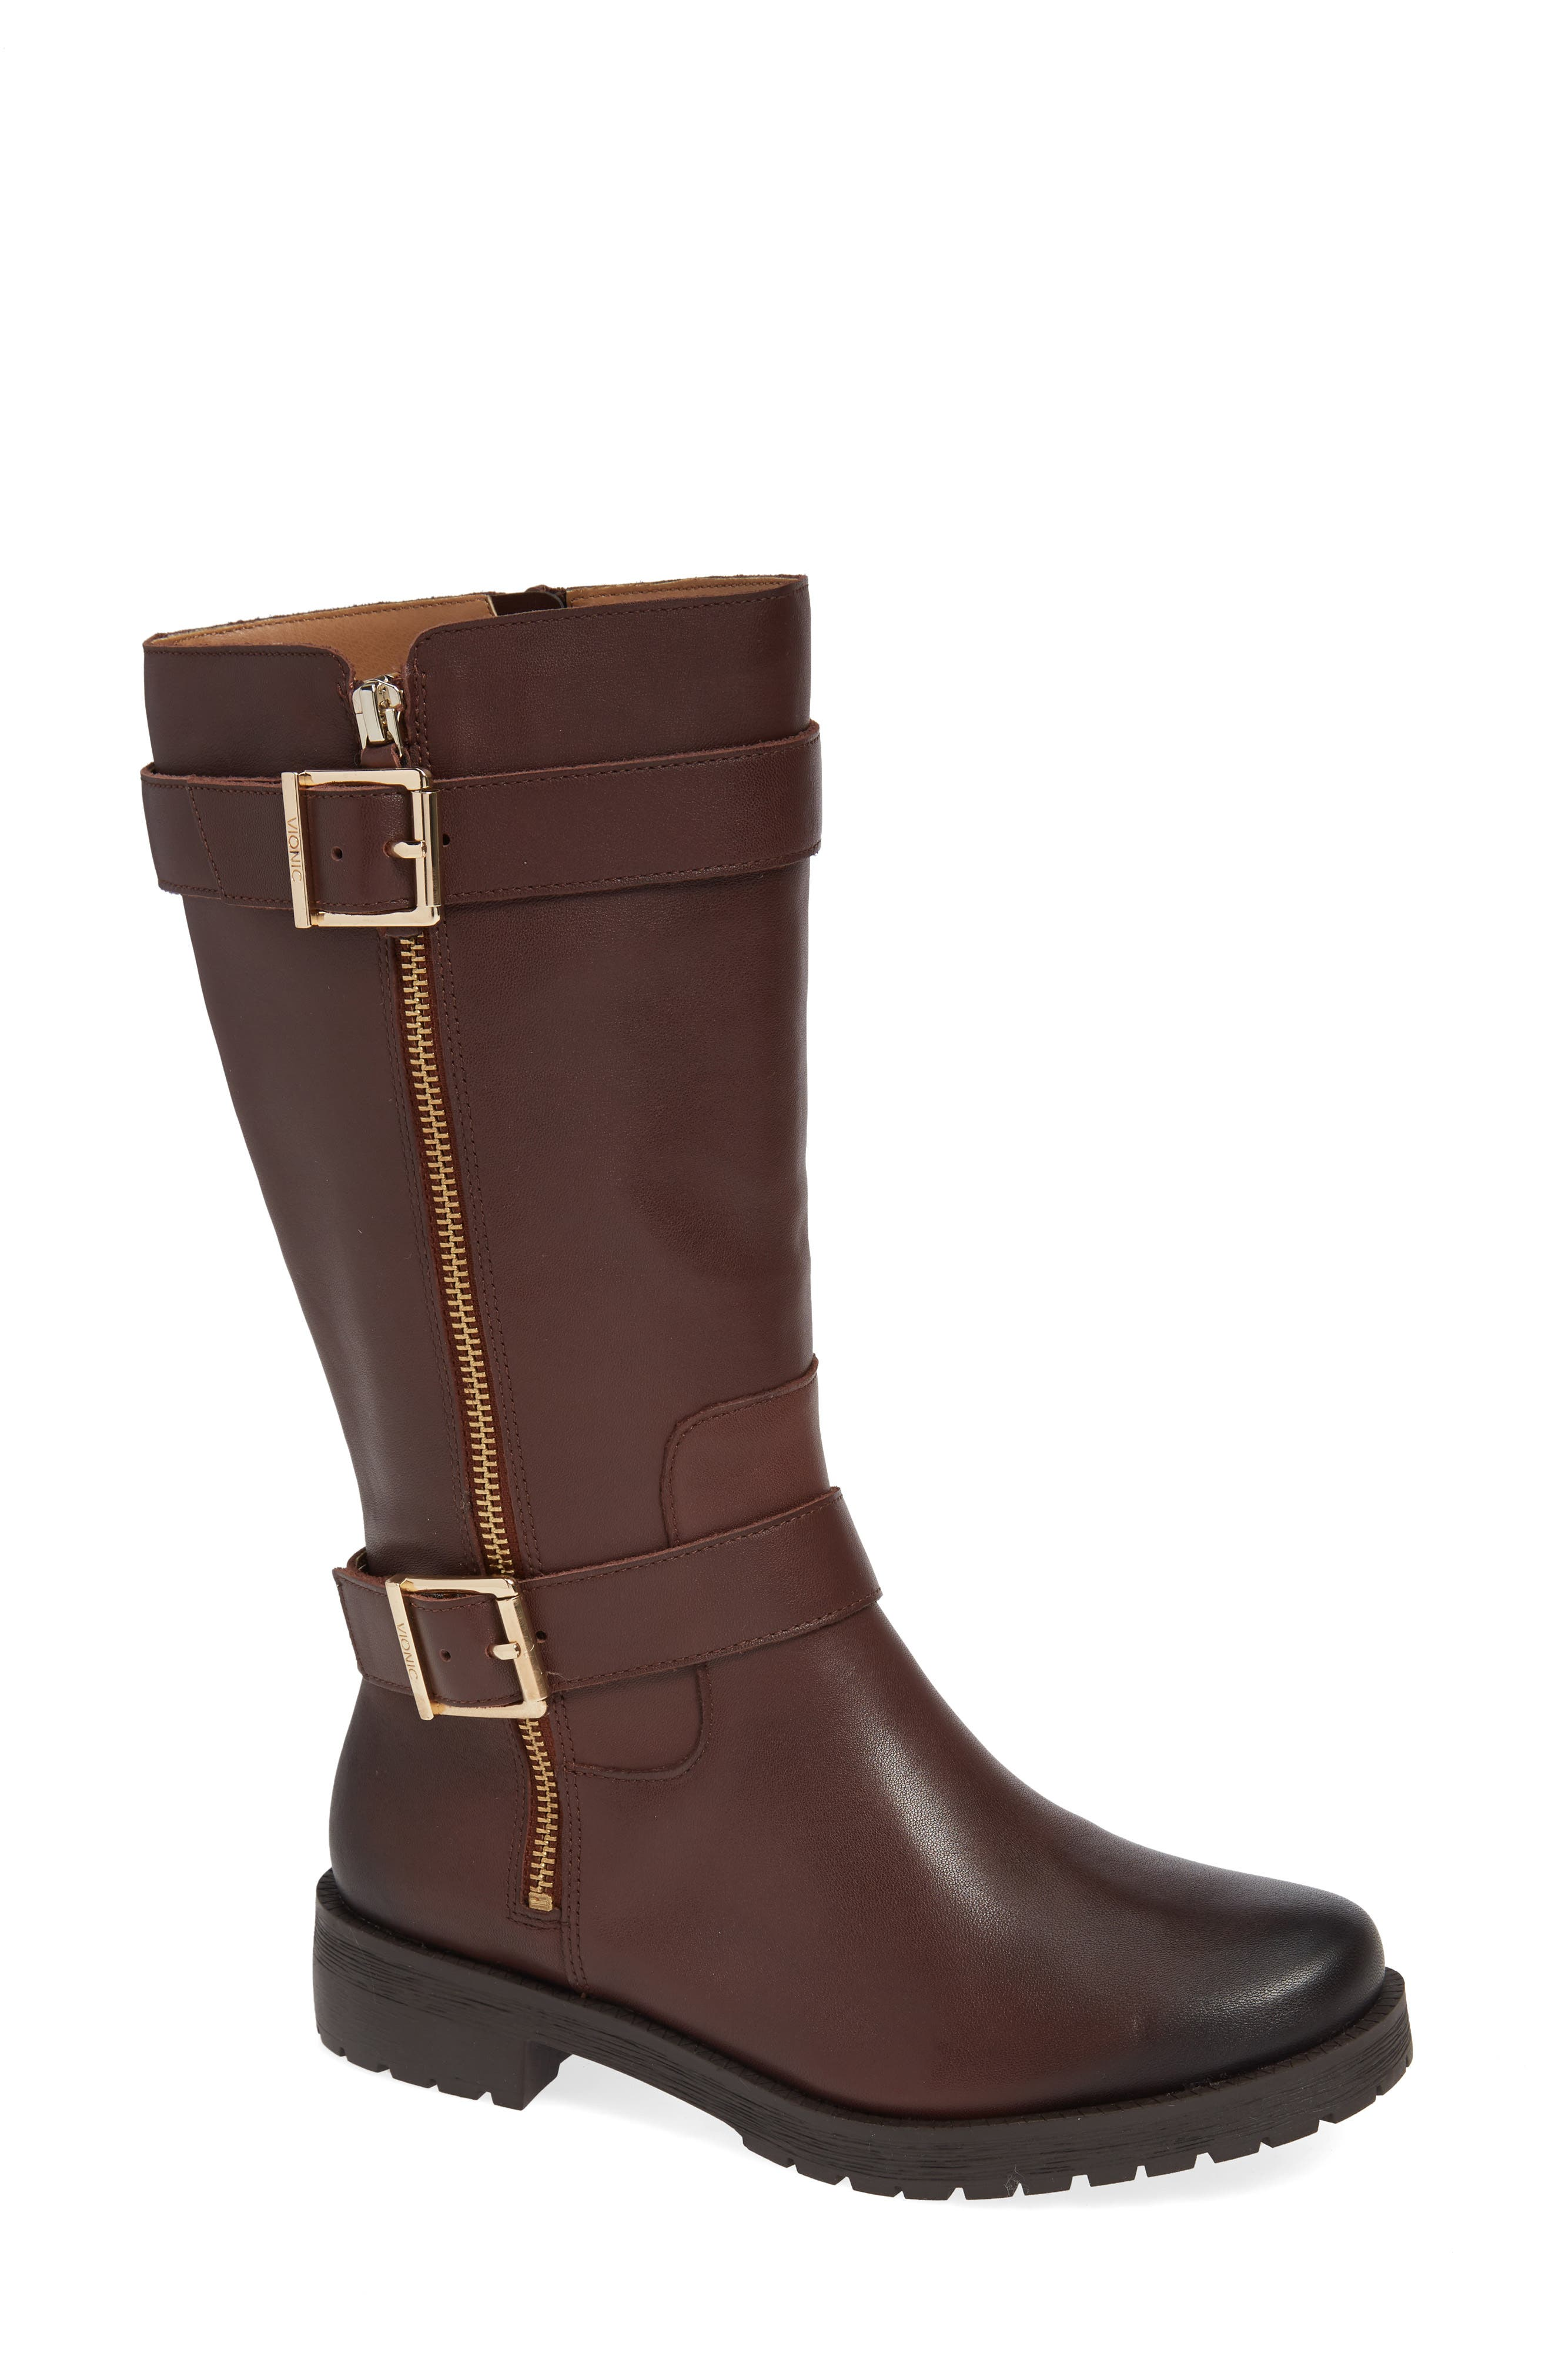 Vionic Marlow Boot, Brown